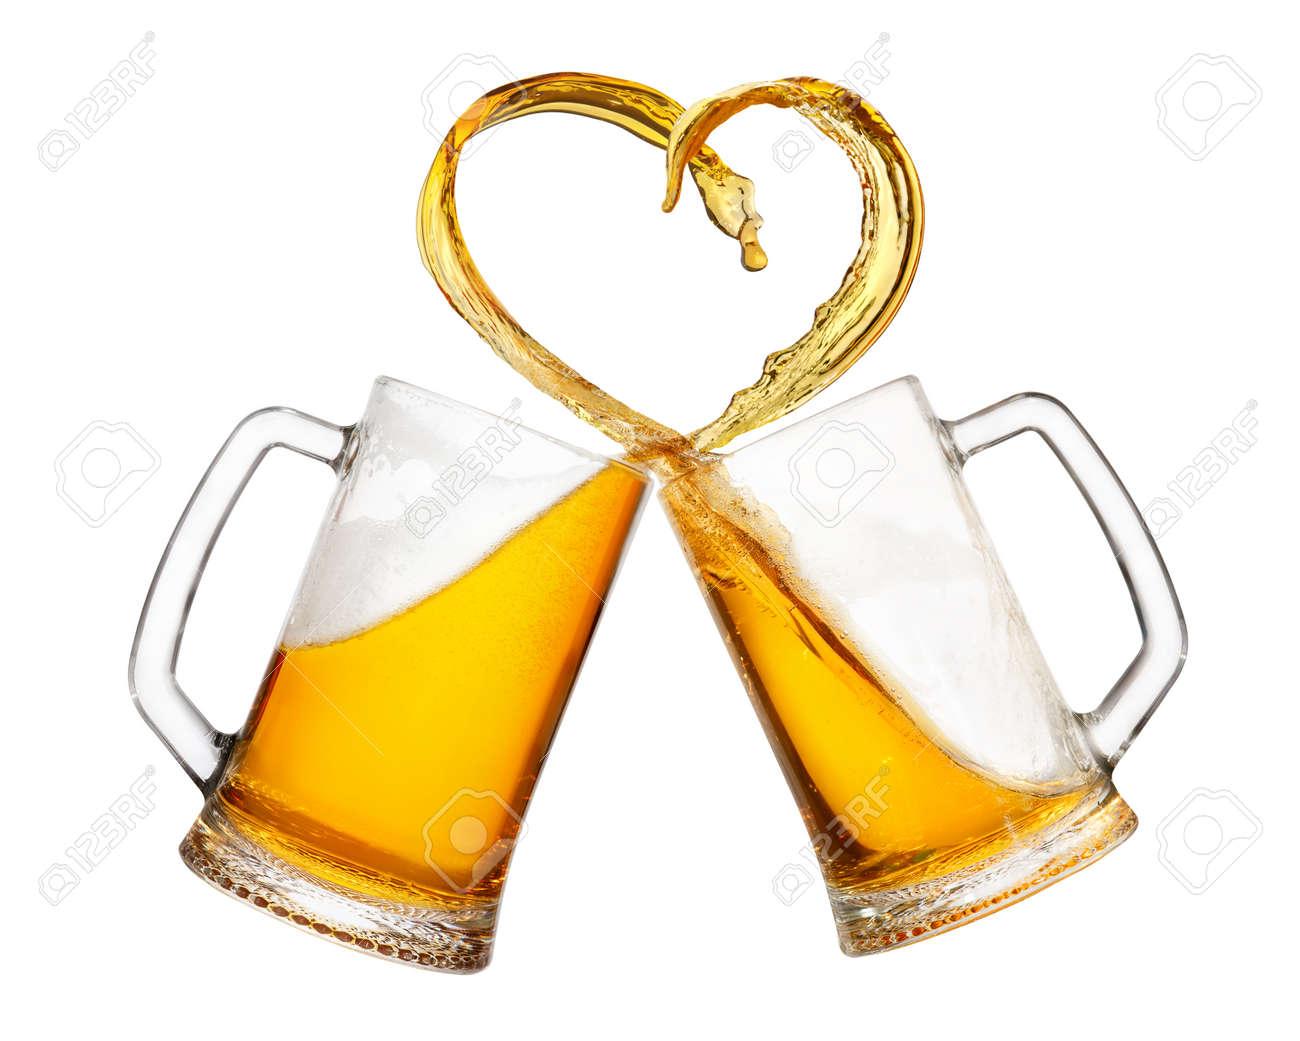 mugs of beer with splash - 94577278